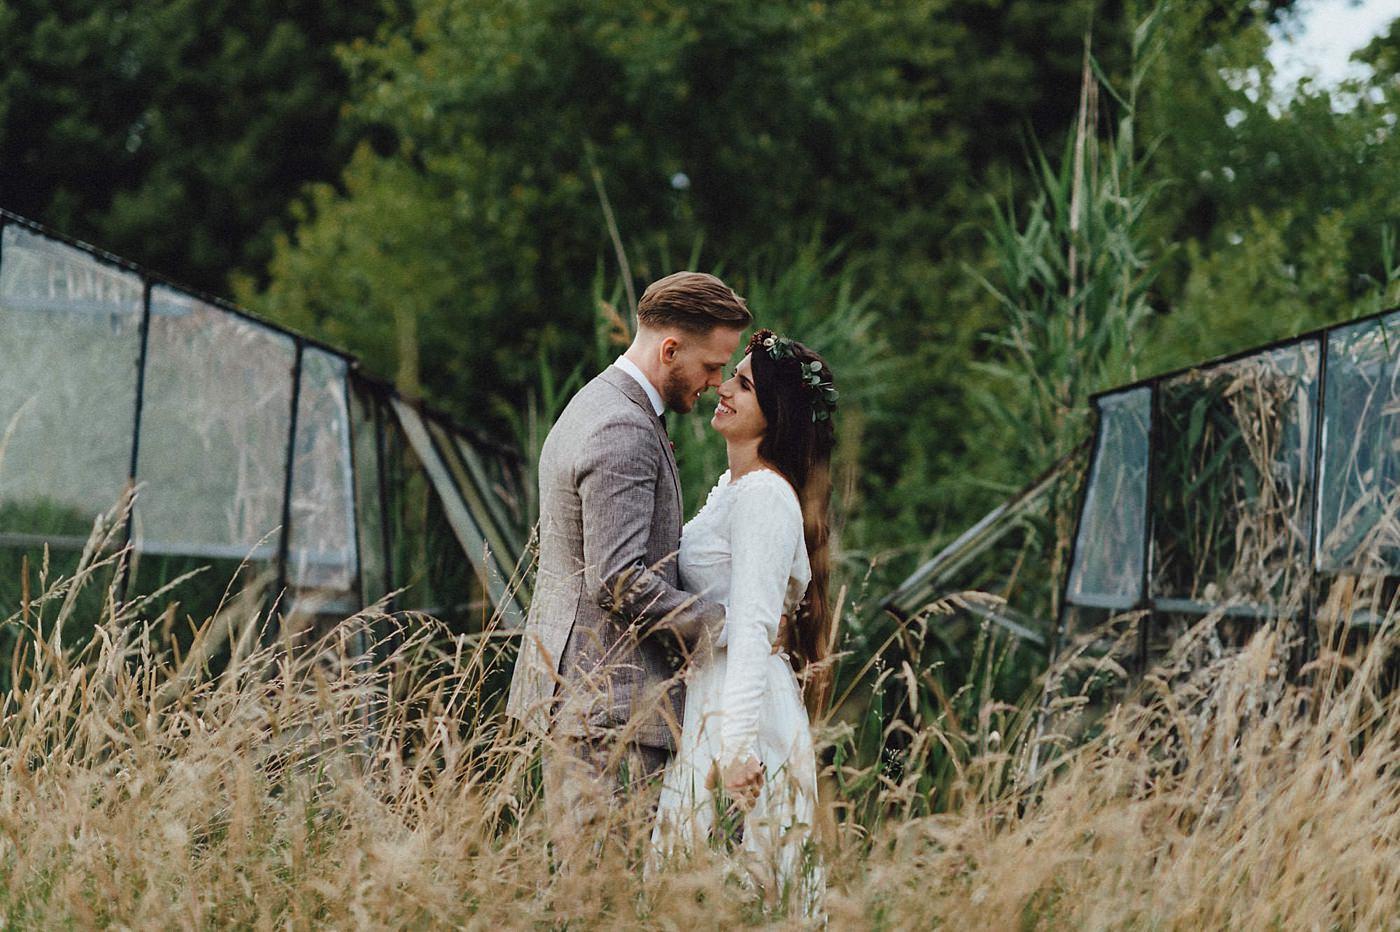 urban-elopement-wedding-251